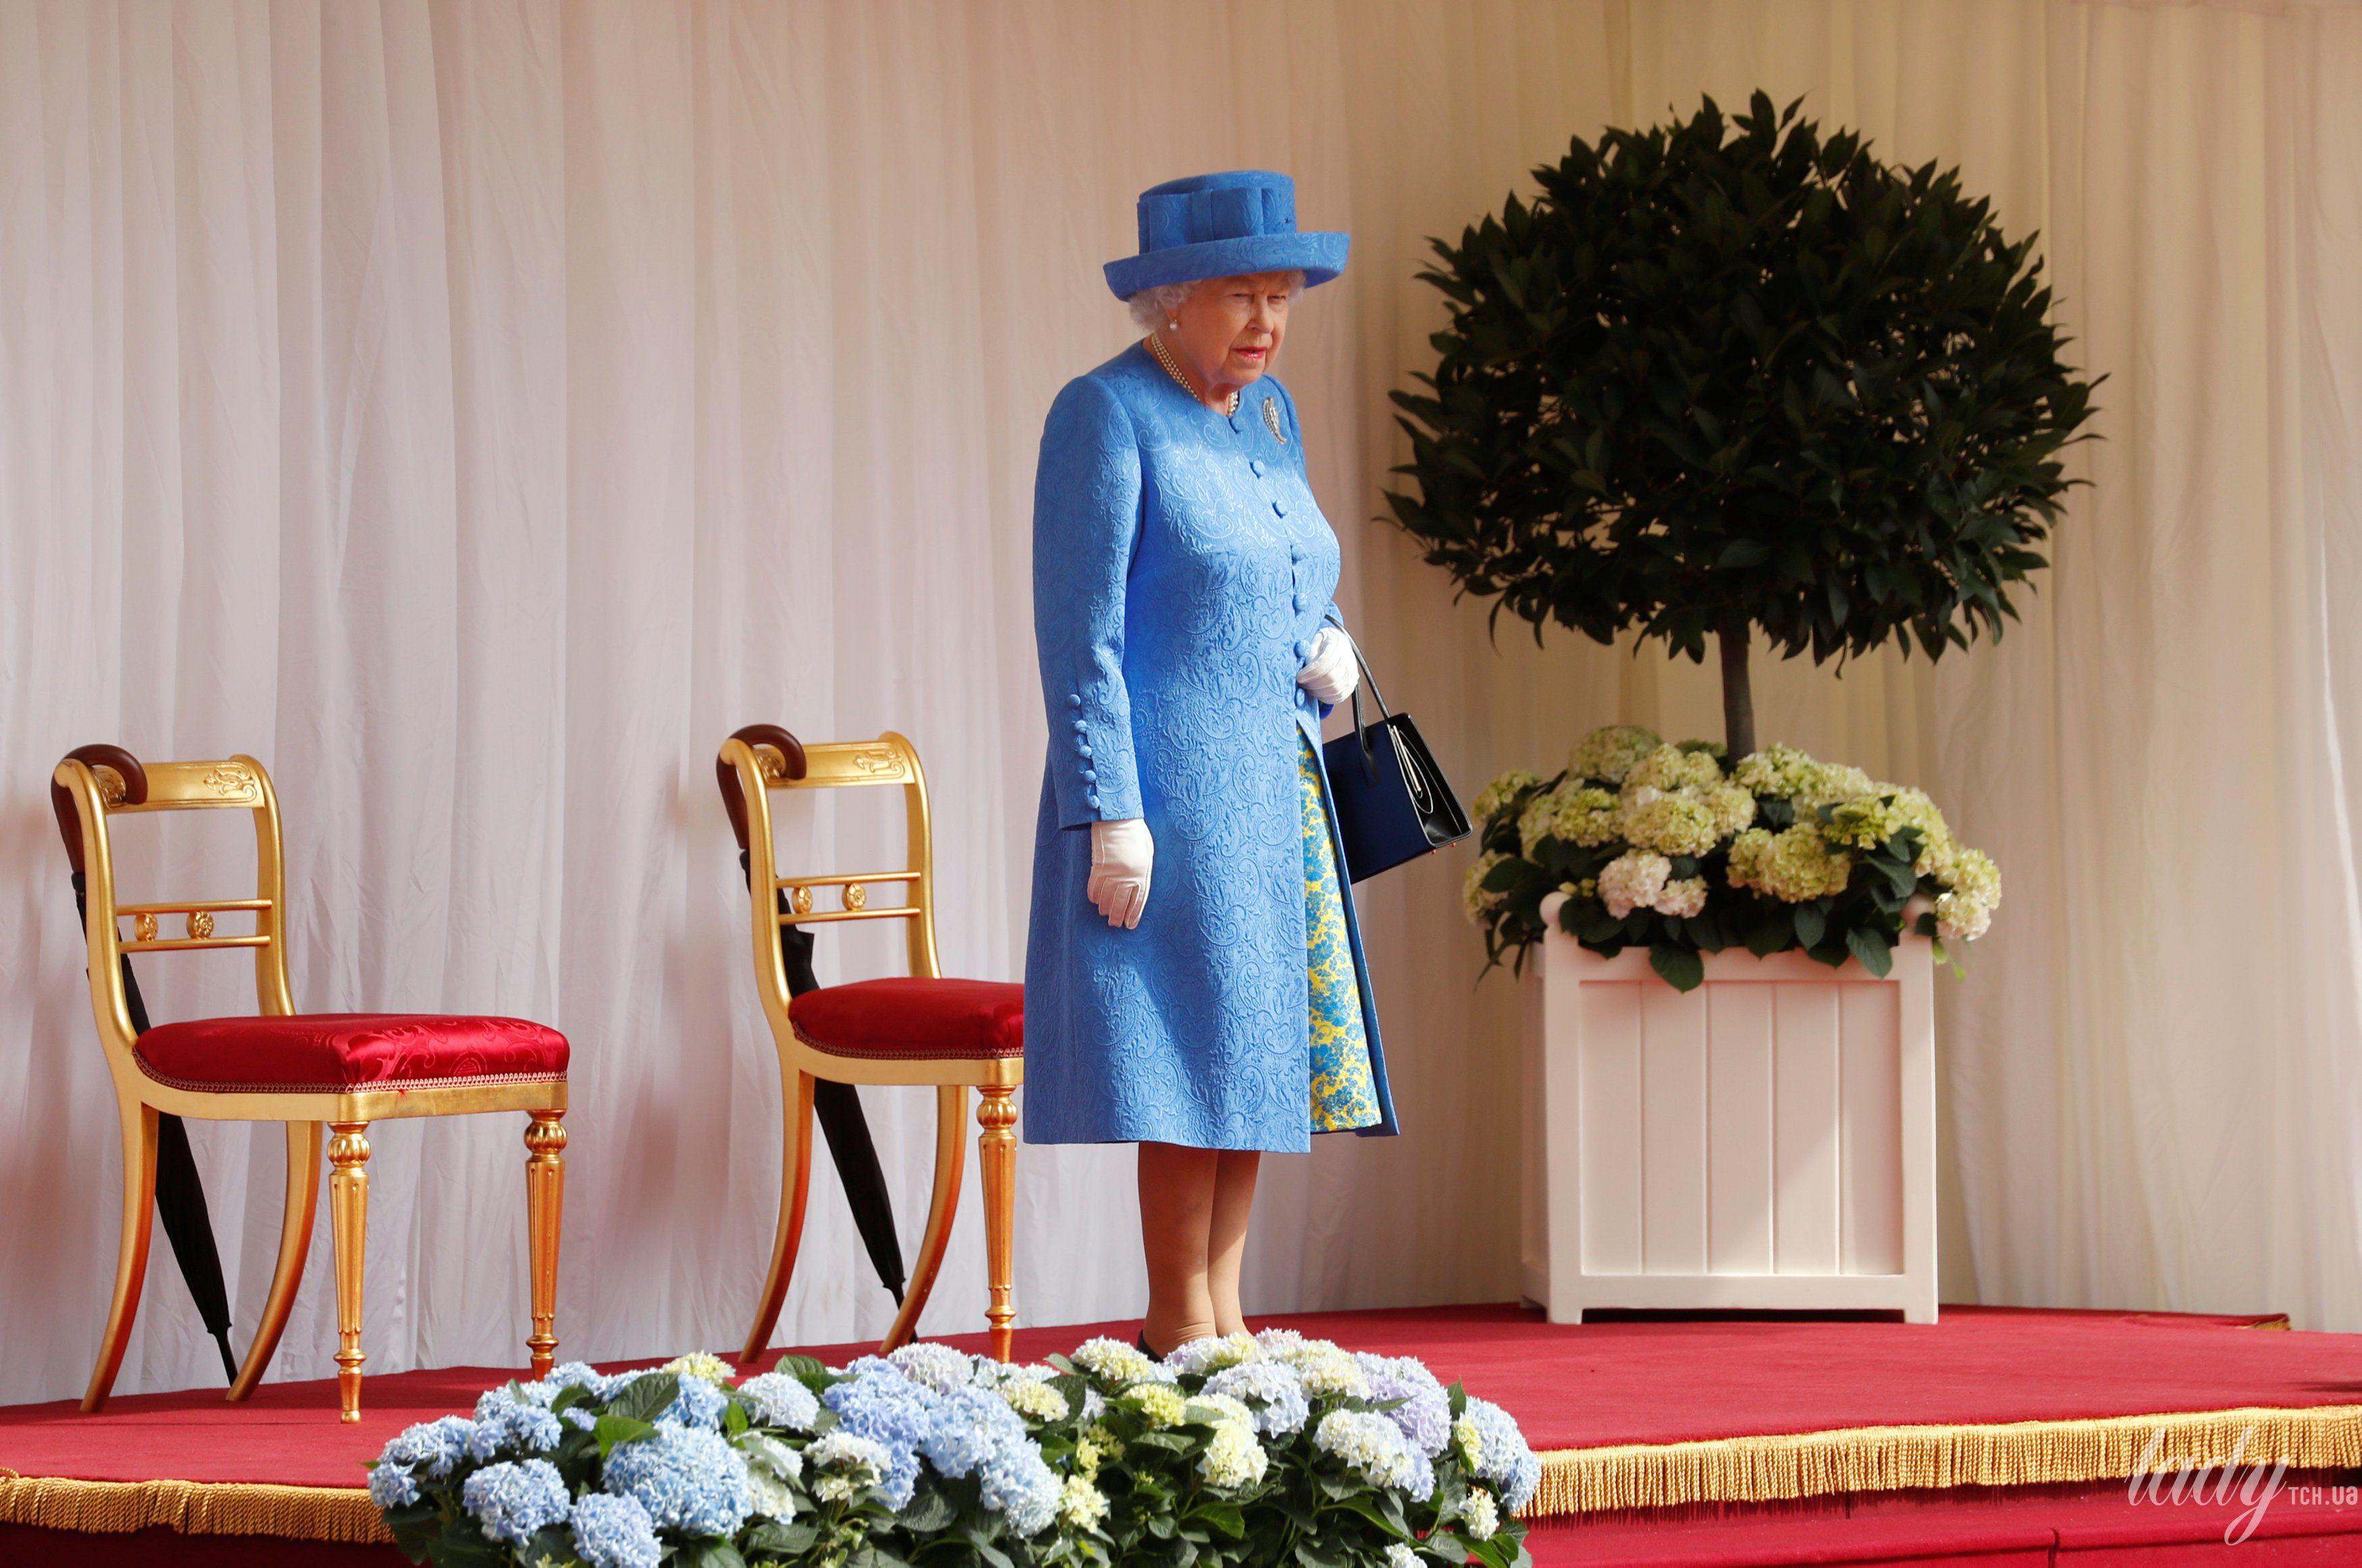 Королева Елизавета II, Мелания Трамп и Дональд Трамп_14